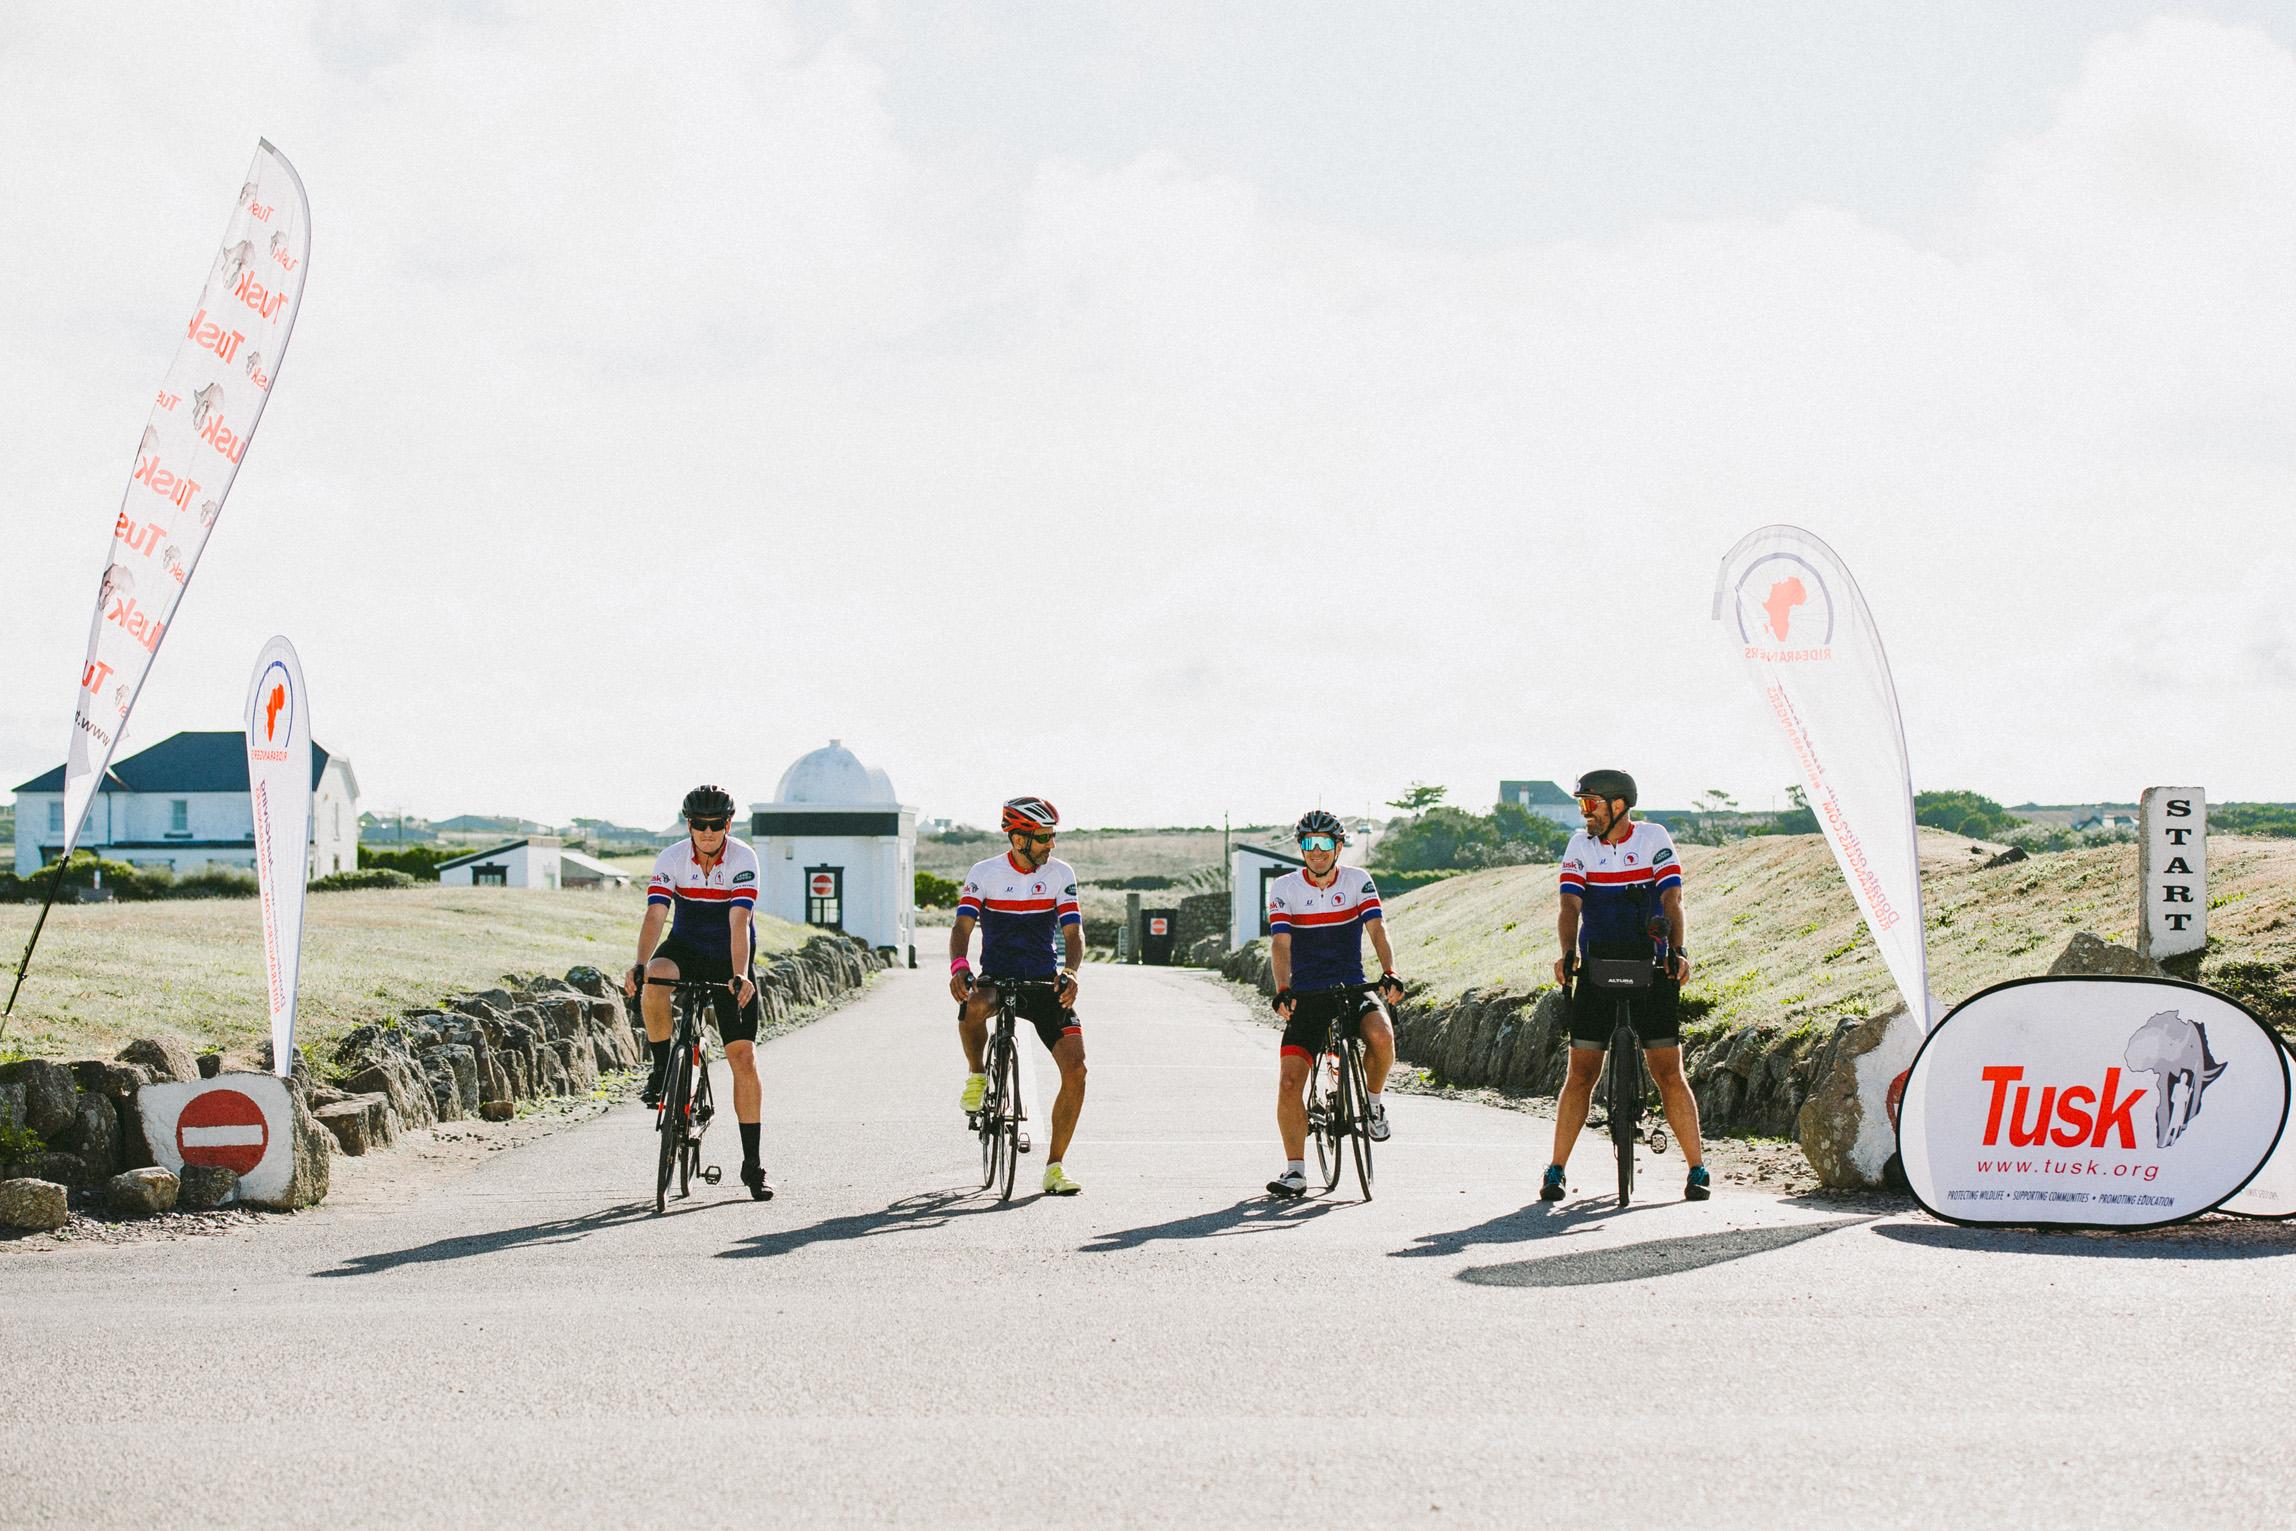 The Ride4Rangers team set off